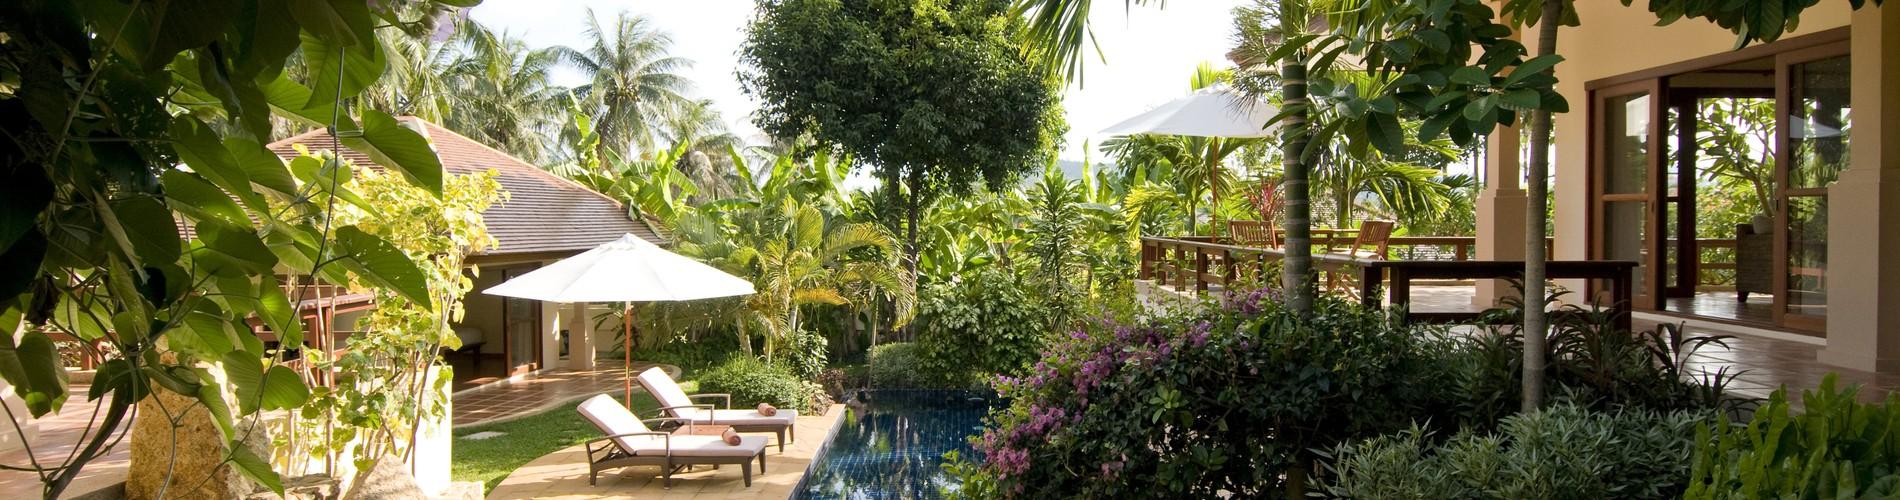 Vacation Rental Plantation Villa 06 Lamyai